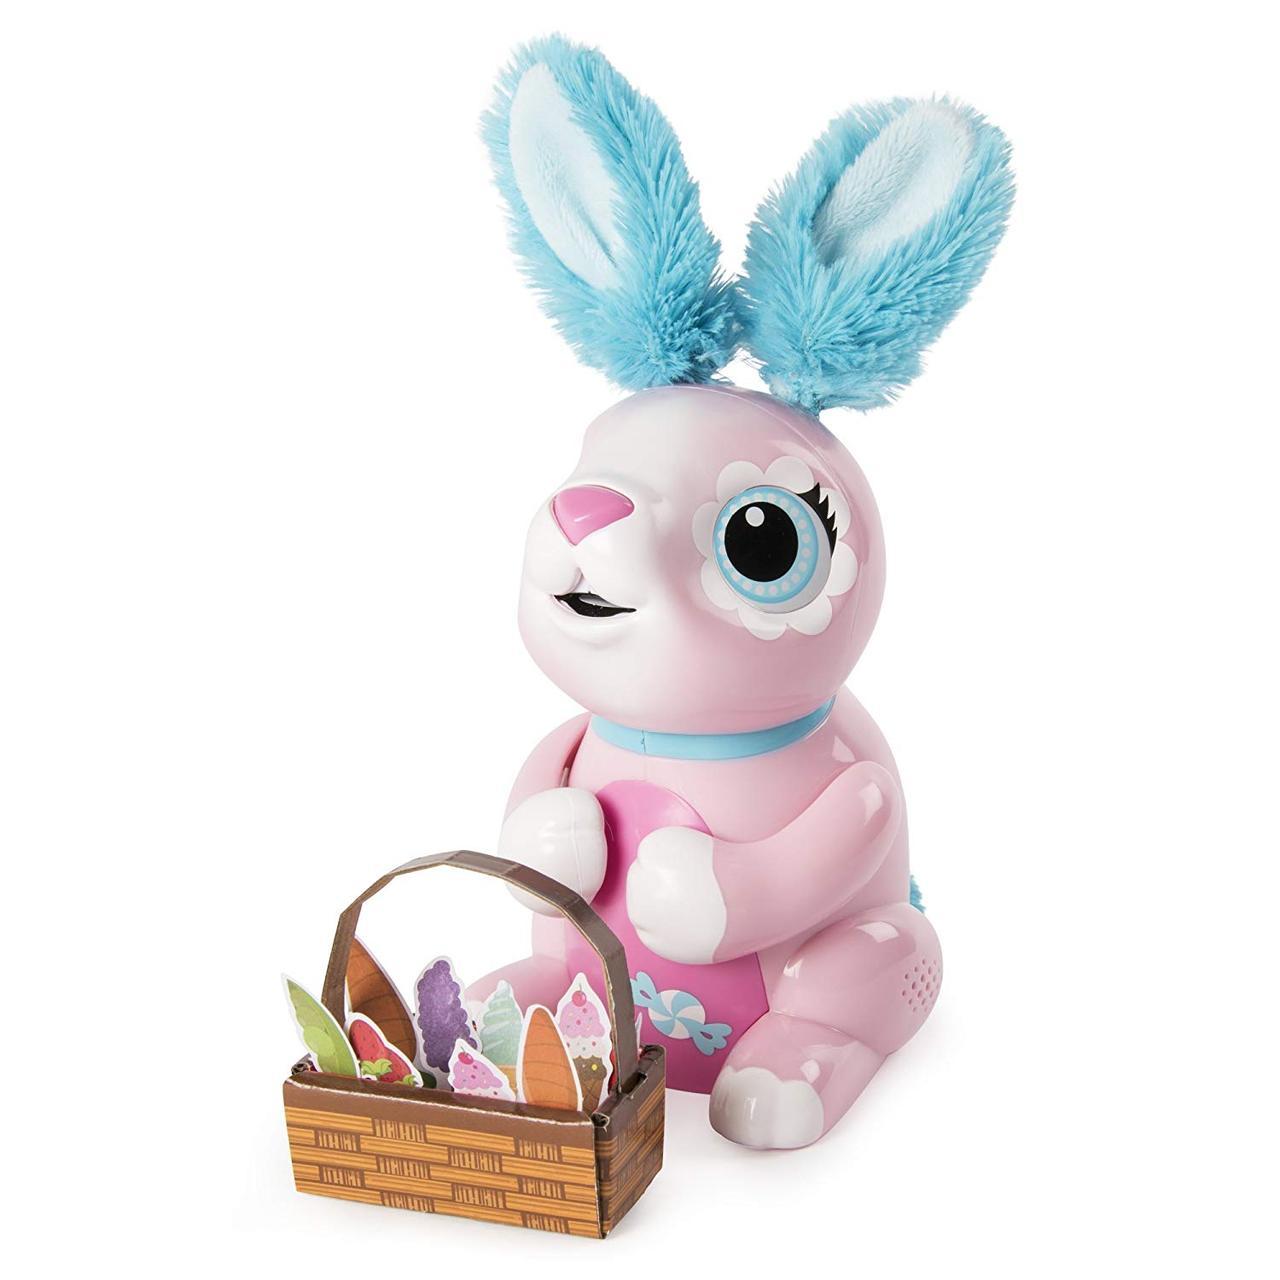 Интерактивный кролик Хрумчик Zoomer Hungry Bunnies Shreddy Interactive Robotic Rabbit That Eats Spin Master